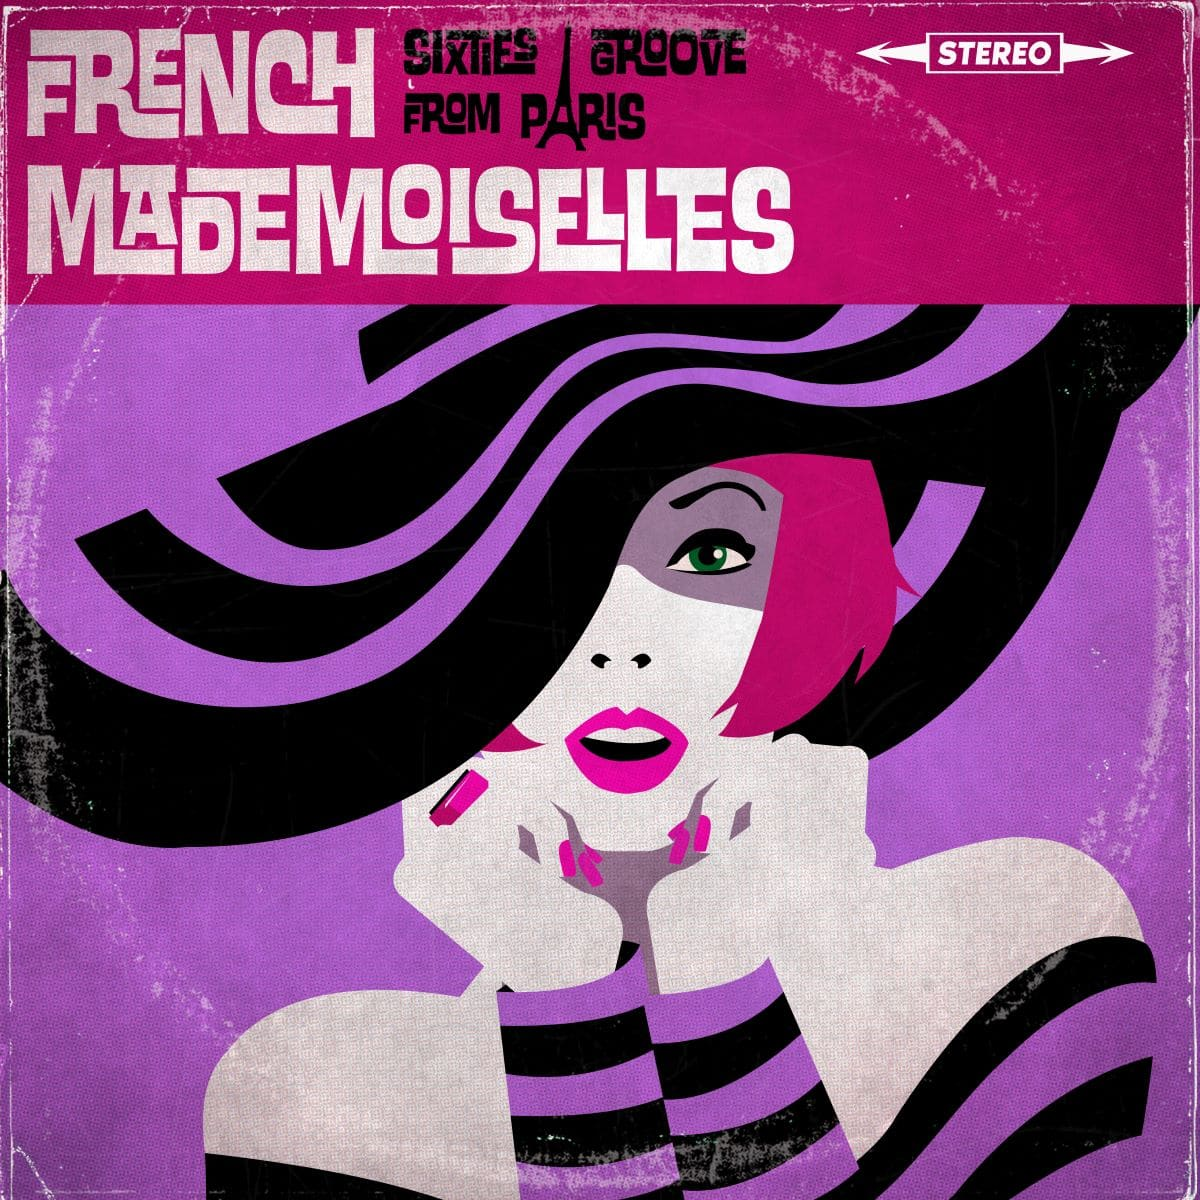 French Mademoiselle - Comment devenir une véritable French Mademoiselle ?